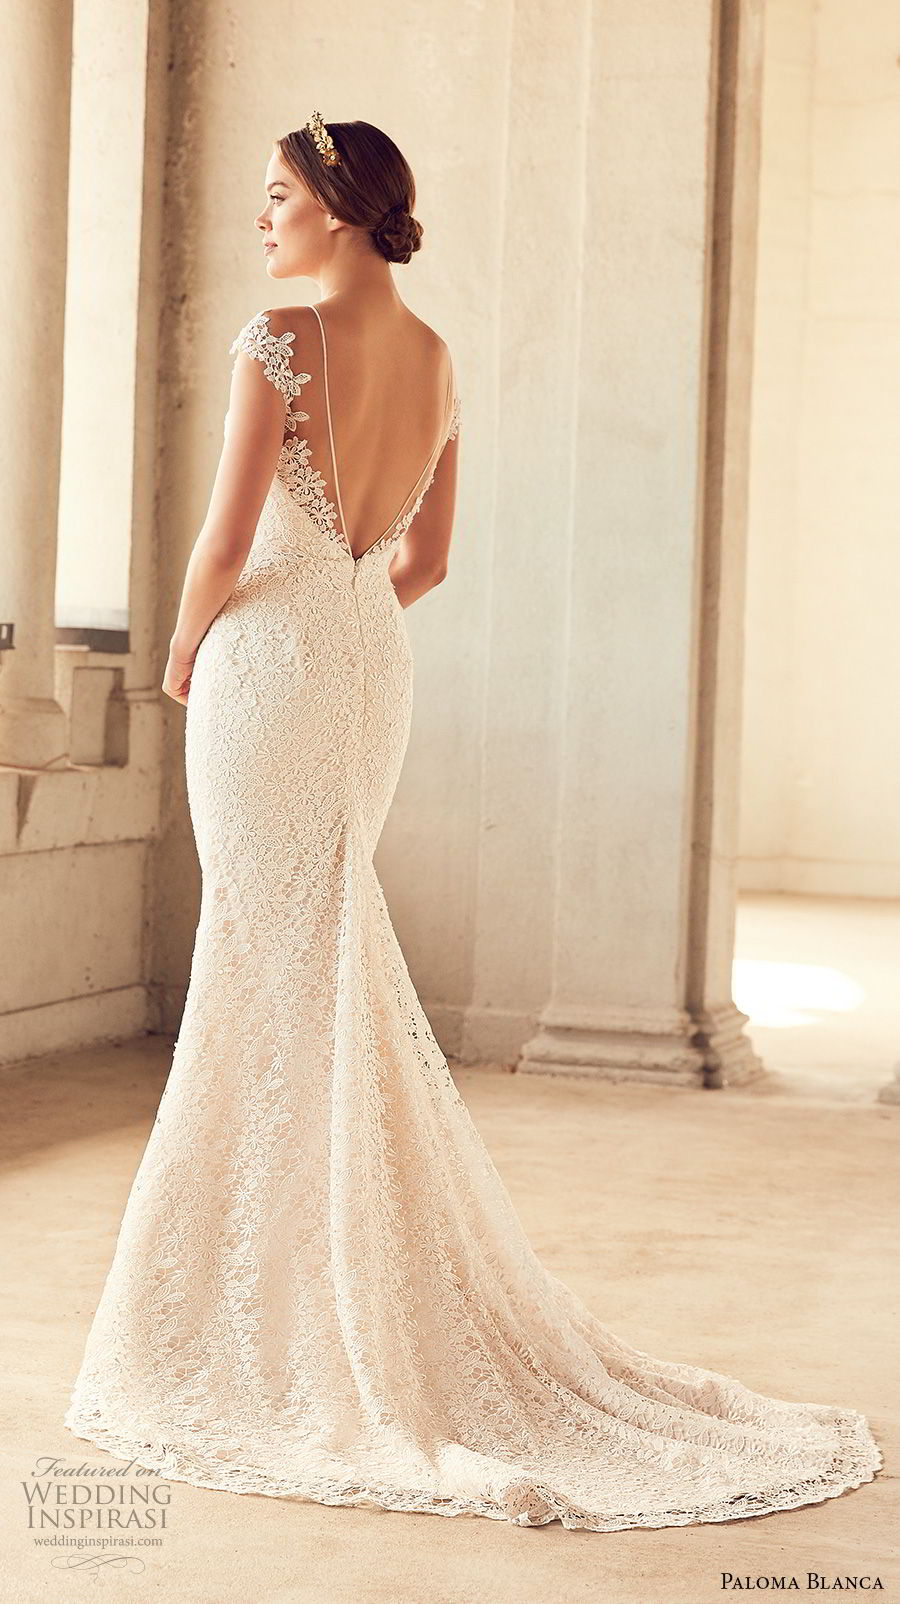 Paloma Blanca Spring 2018 Wedding Dresses Wedding Inspirasi